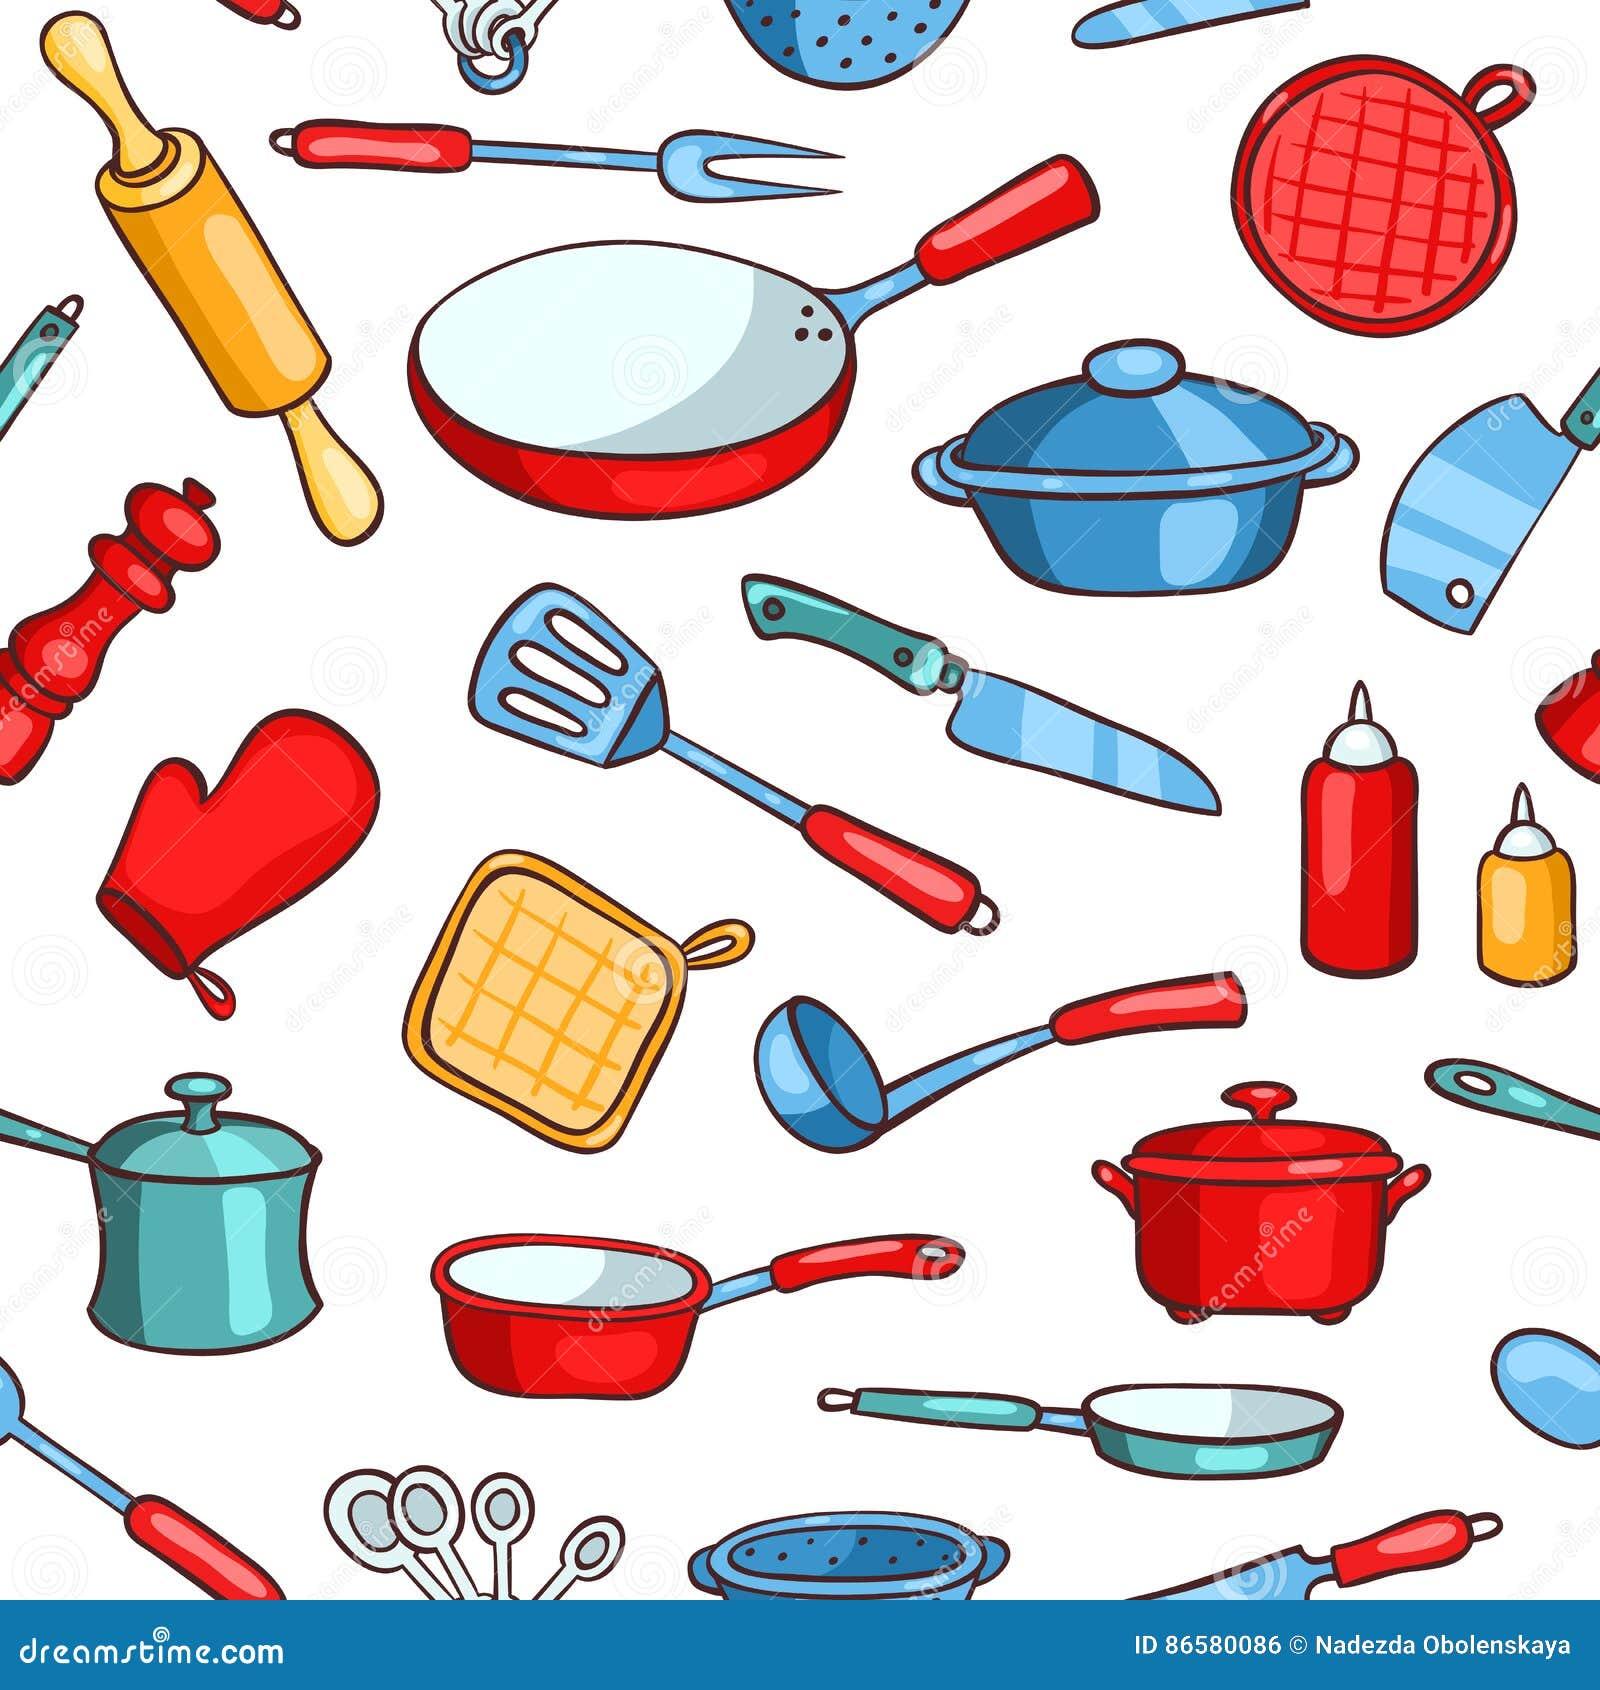 Seamless Pattern Cartoon Kitchen Ware Stock Vector Illustration Of Chef Fork 86580086